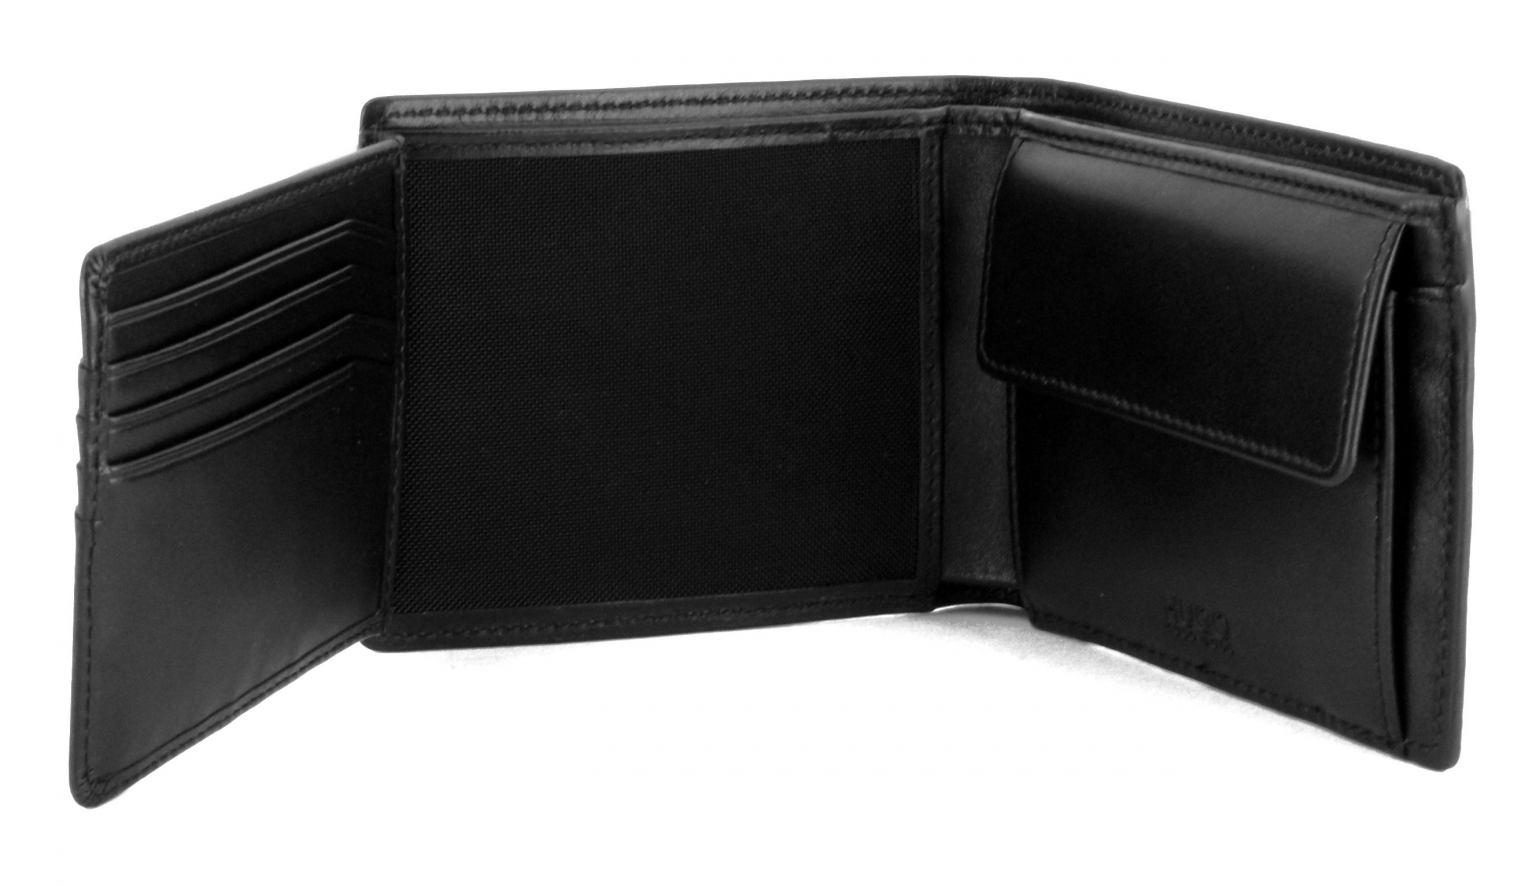 c05298469a616 Herrenbörse Subway Trifold Hugo Boss schwarz - Bags   more